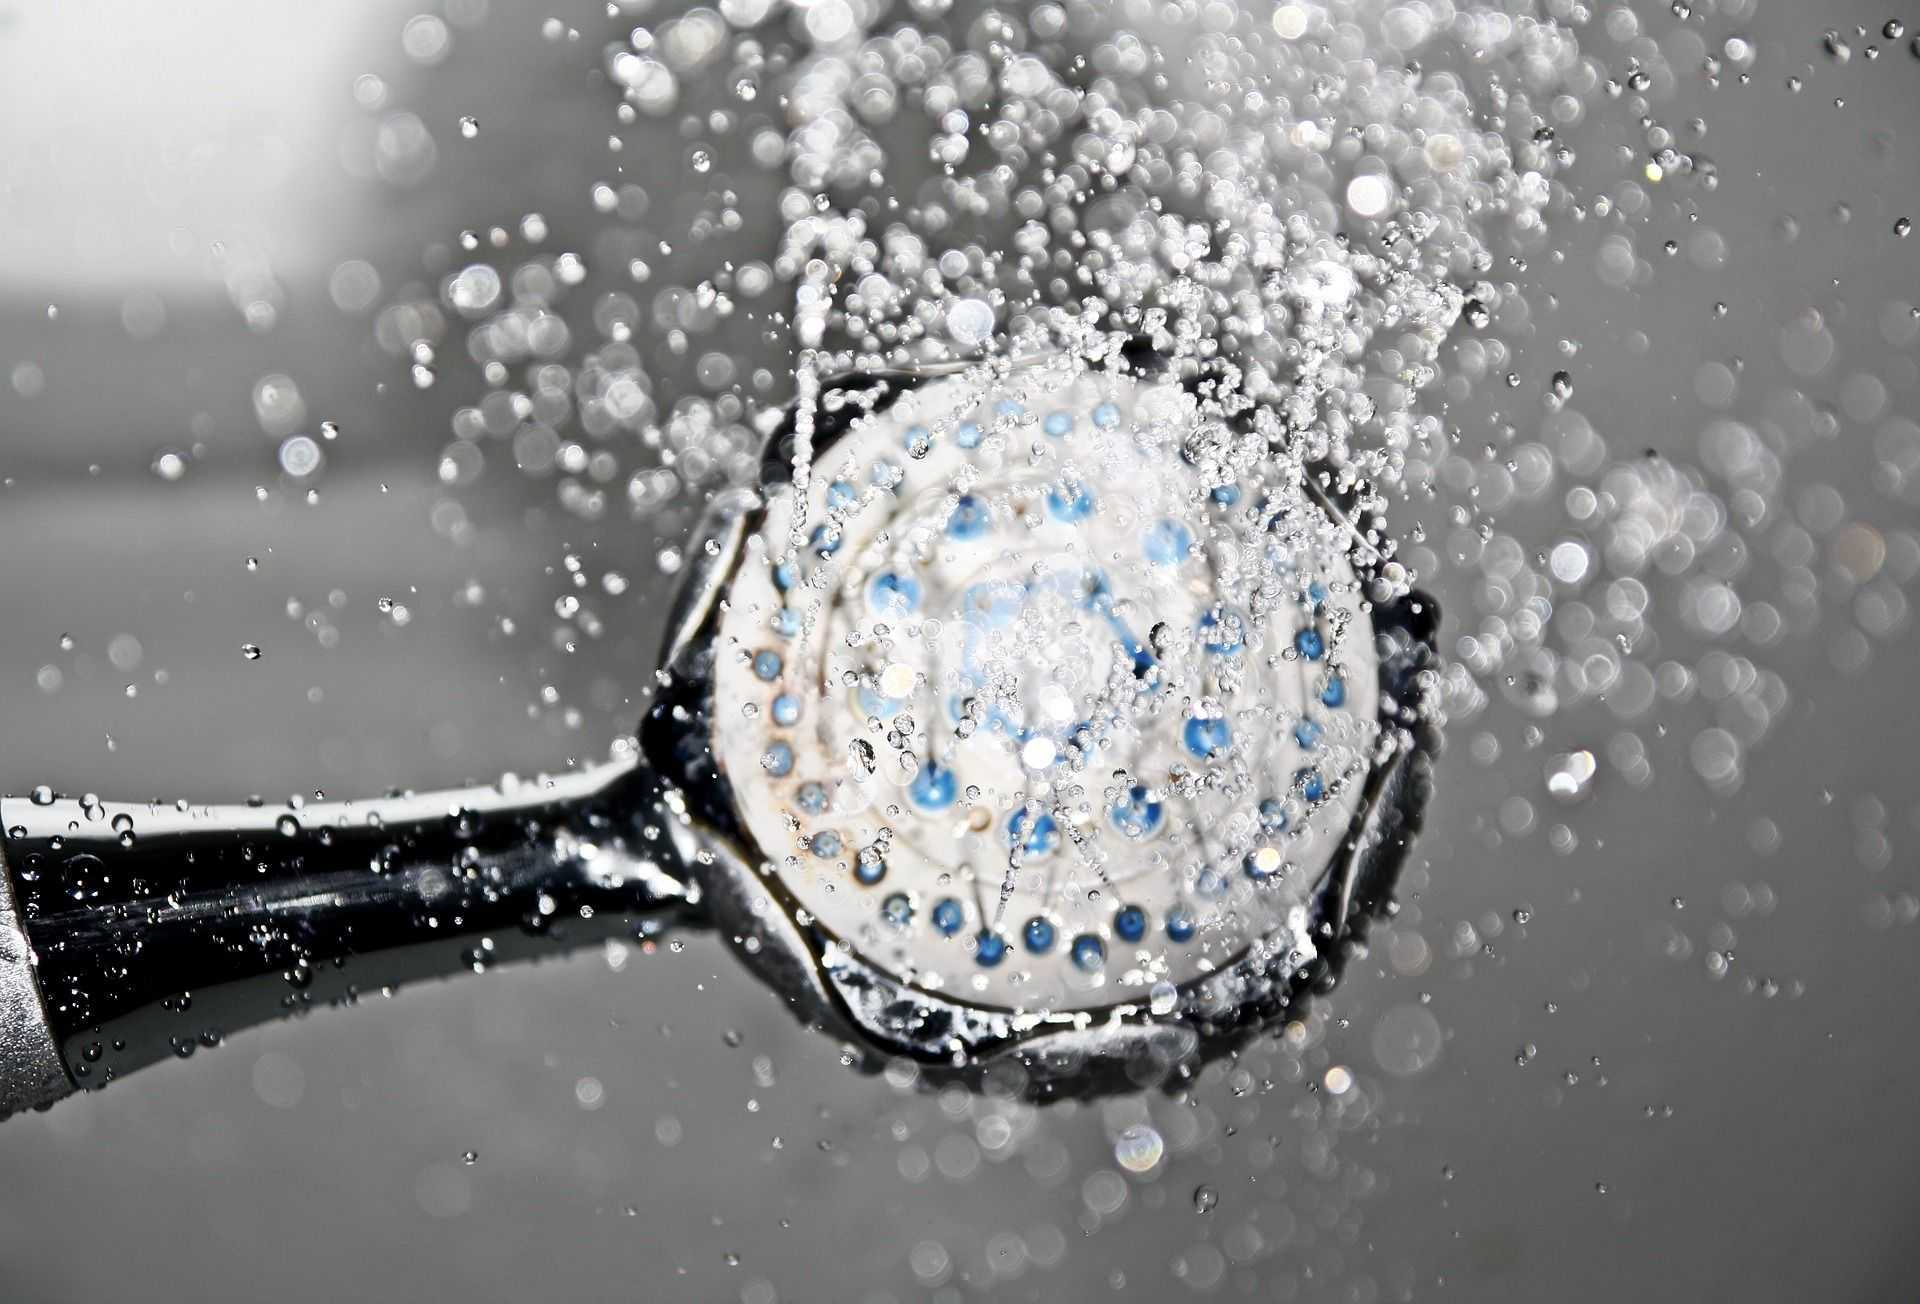 sprcha kapky vody